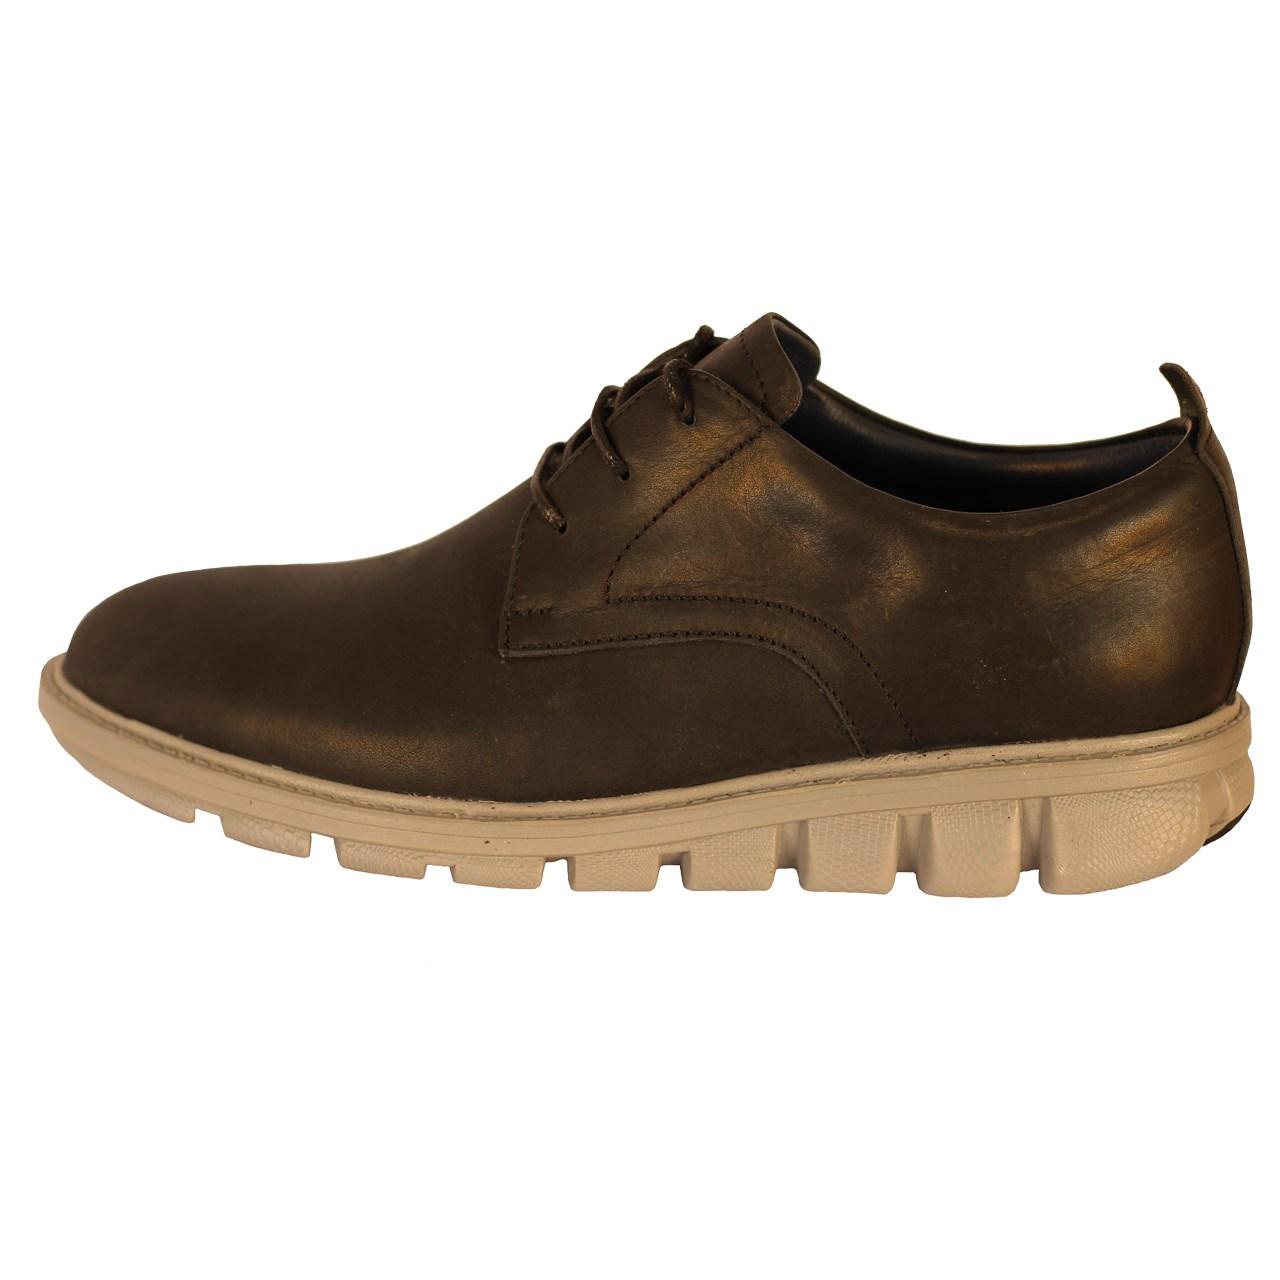 کفش مردانه چرم طبیعی  ژست مدل 1061